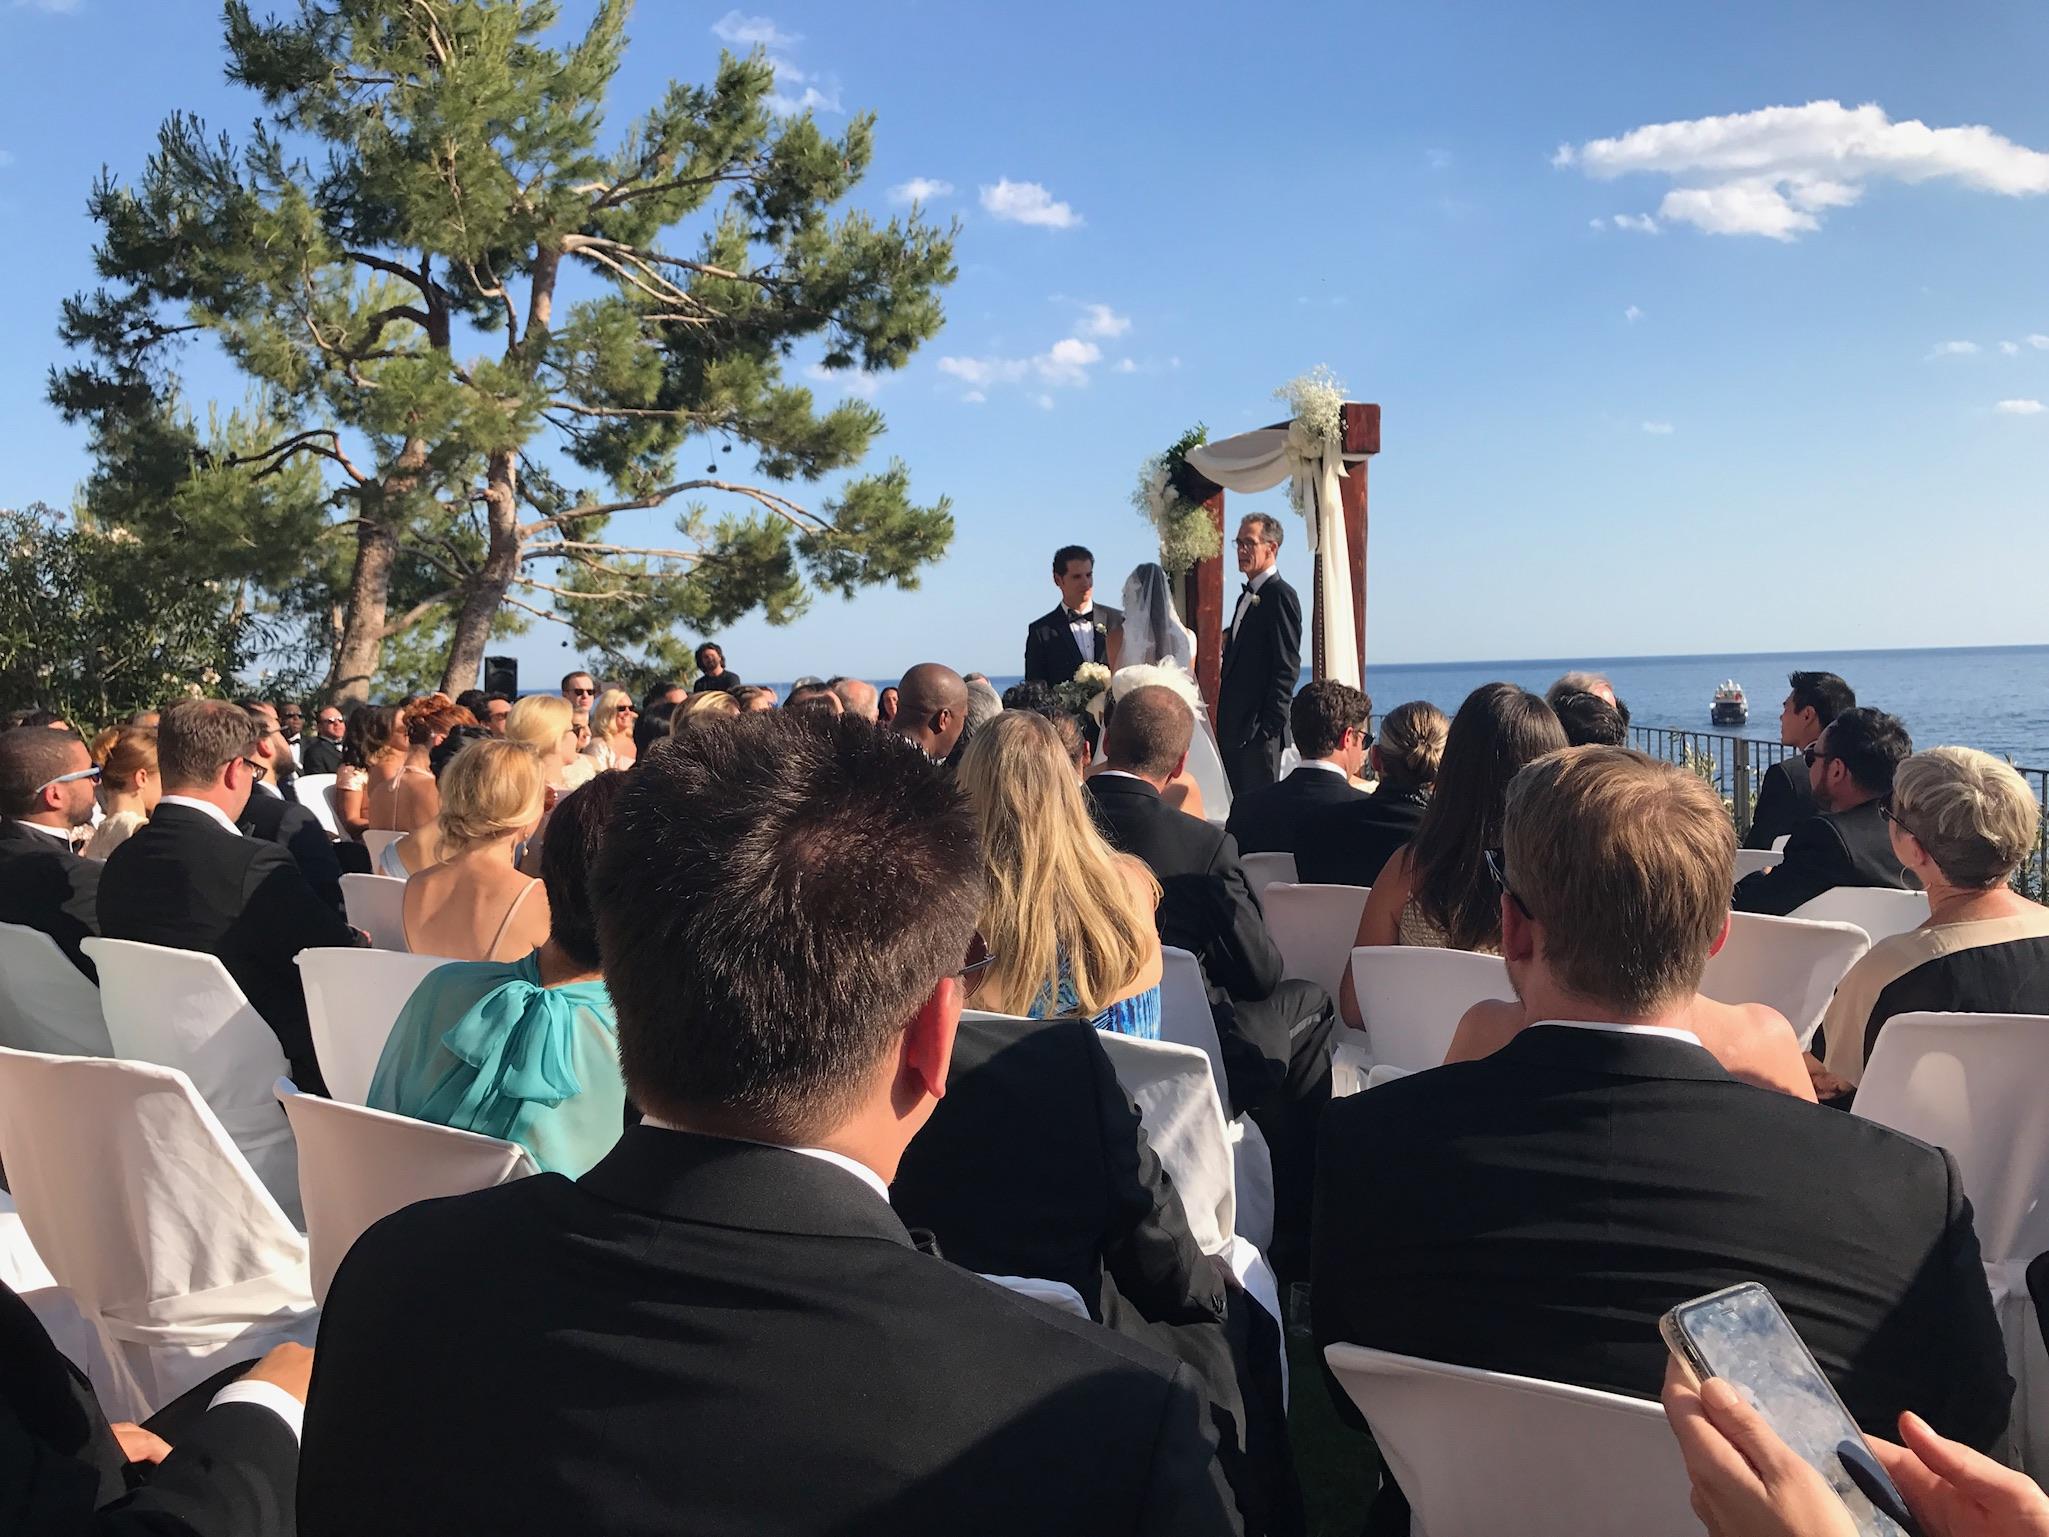 http://www.weddingamalfi.com/wp-content/uploads/Nathalie-and-Benjamin-Wedding-in-Positano-Italy-13.jpg